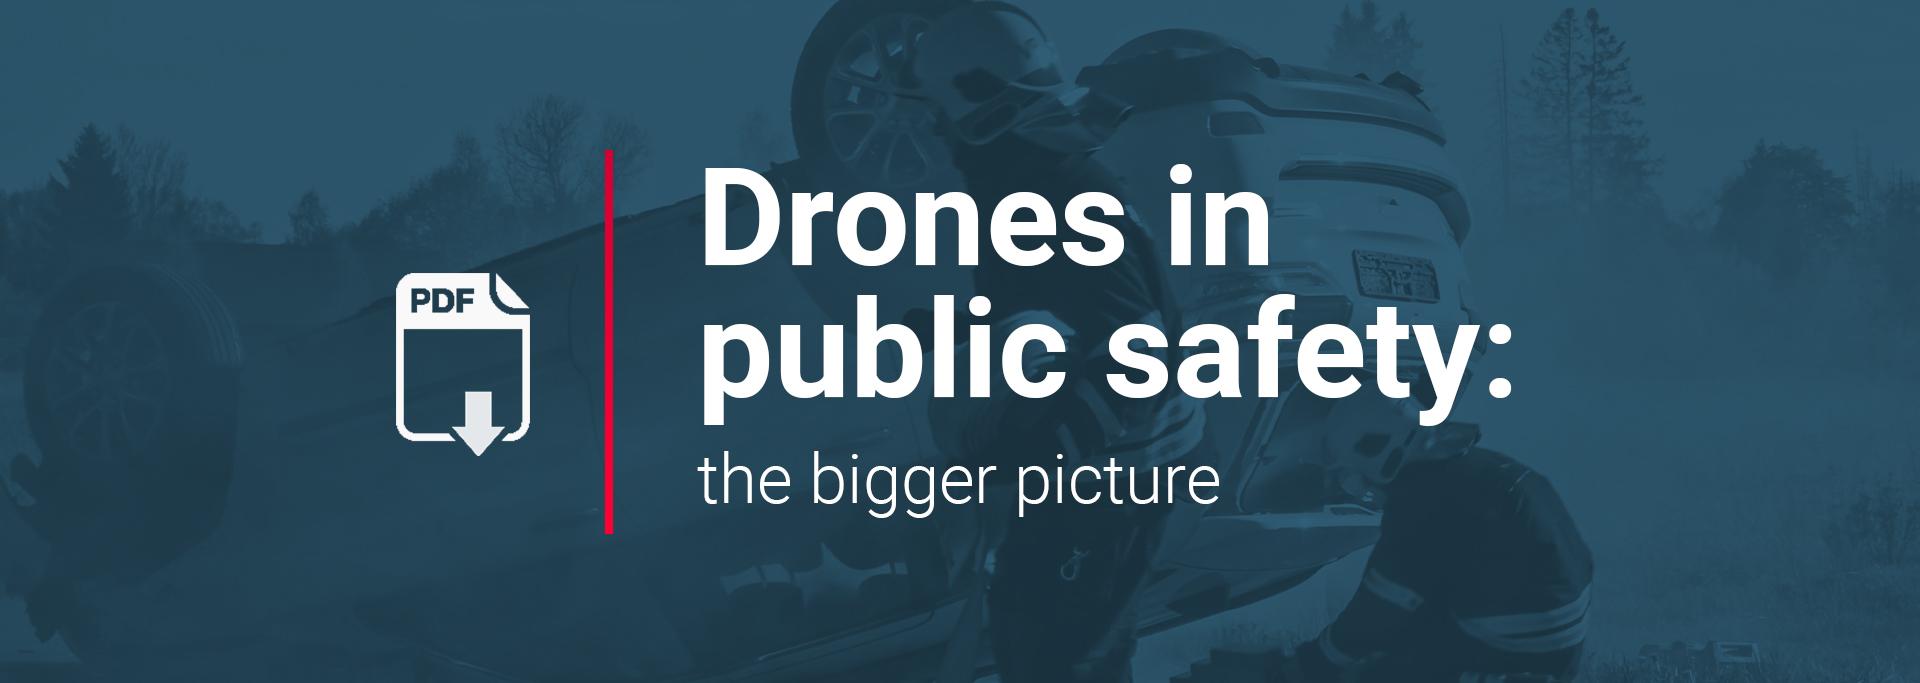 Free ebook: drones in public safey, the bigger picture